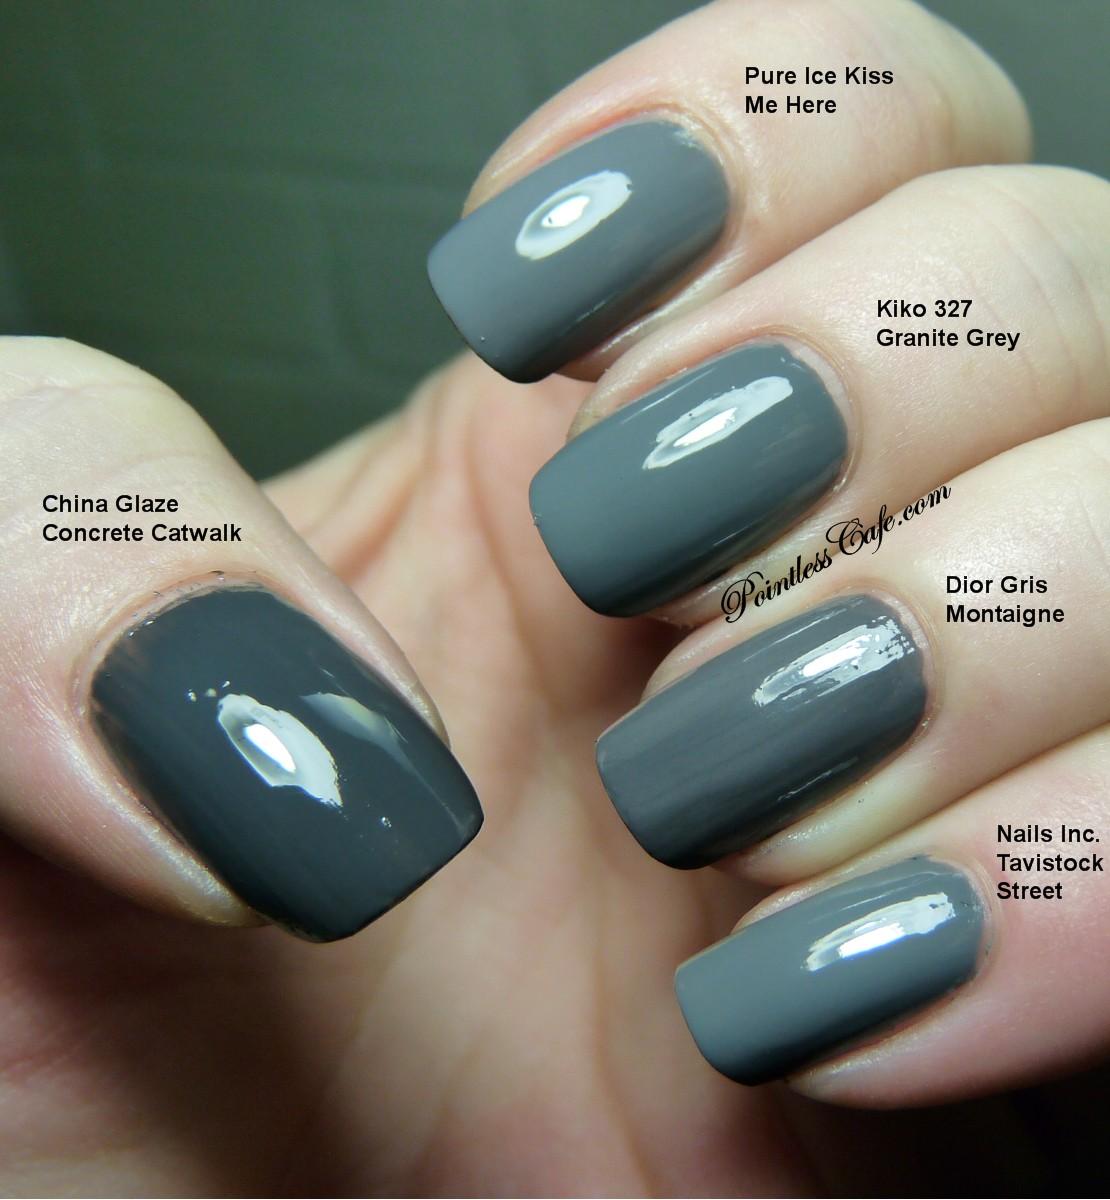 Gris Montaigne Christian Dior nails inc. tavistock street and a grey comparison with dior